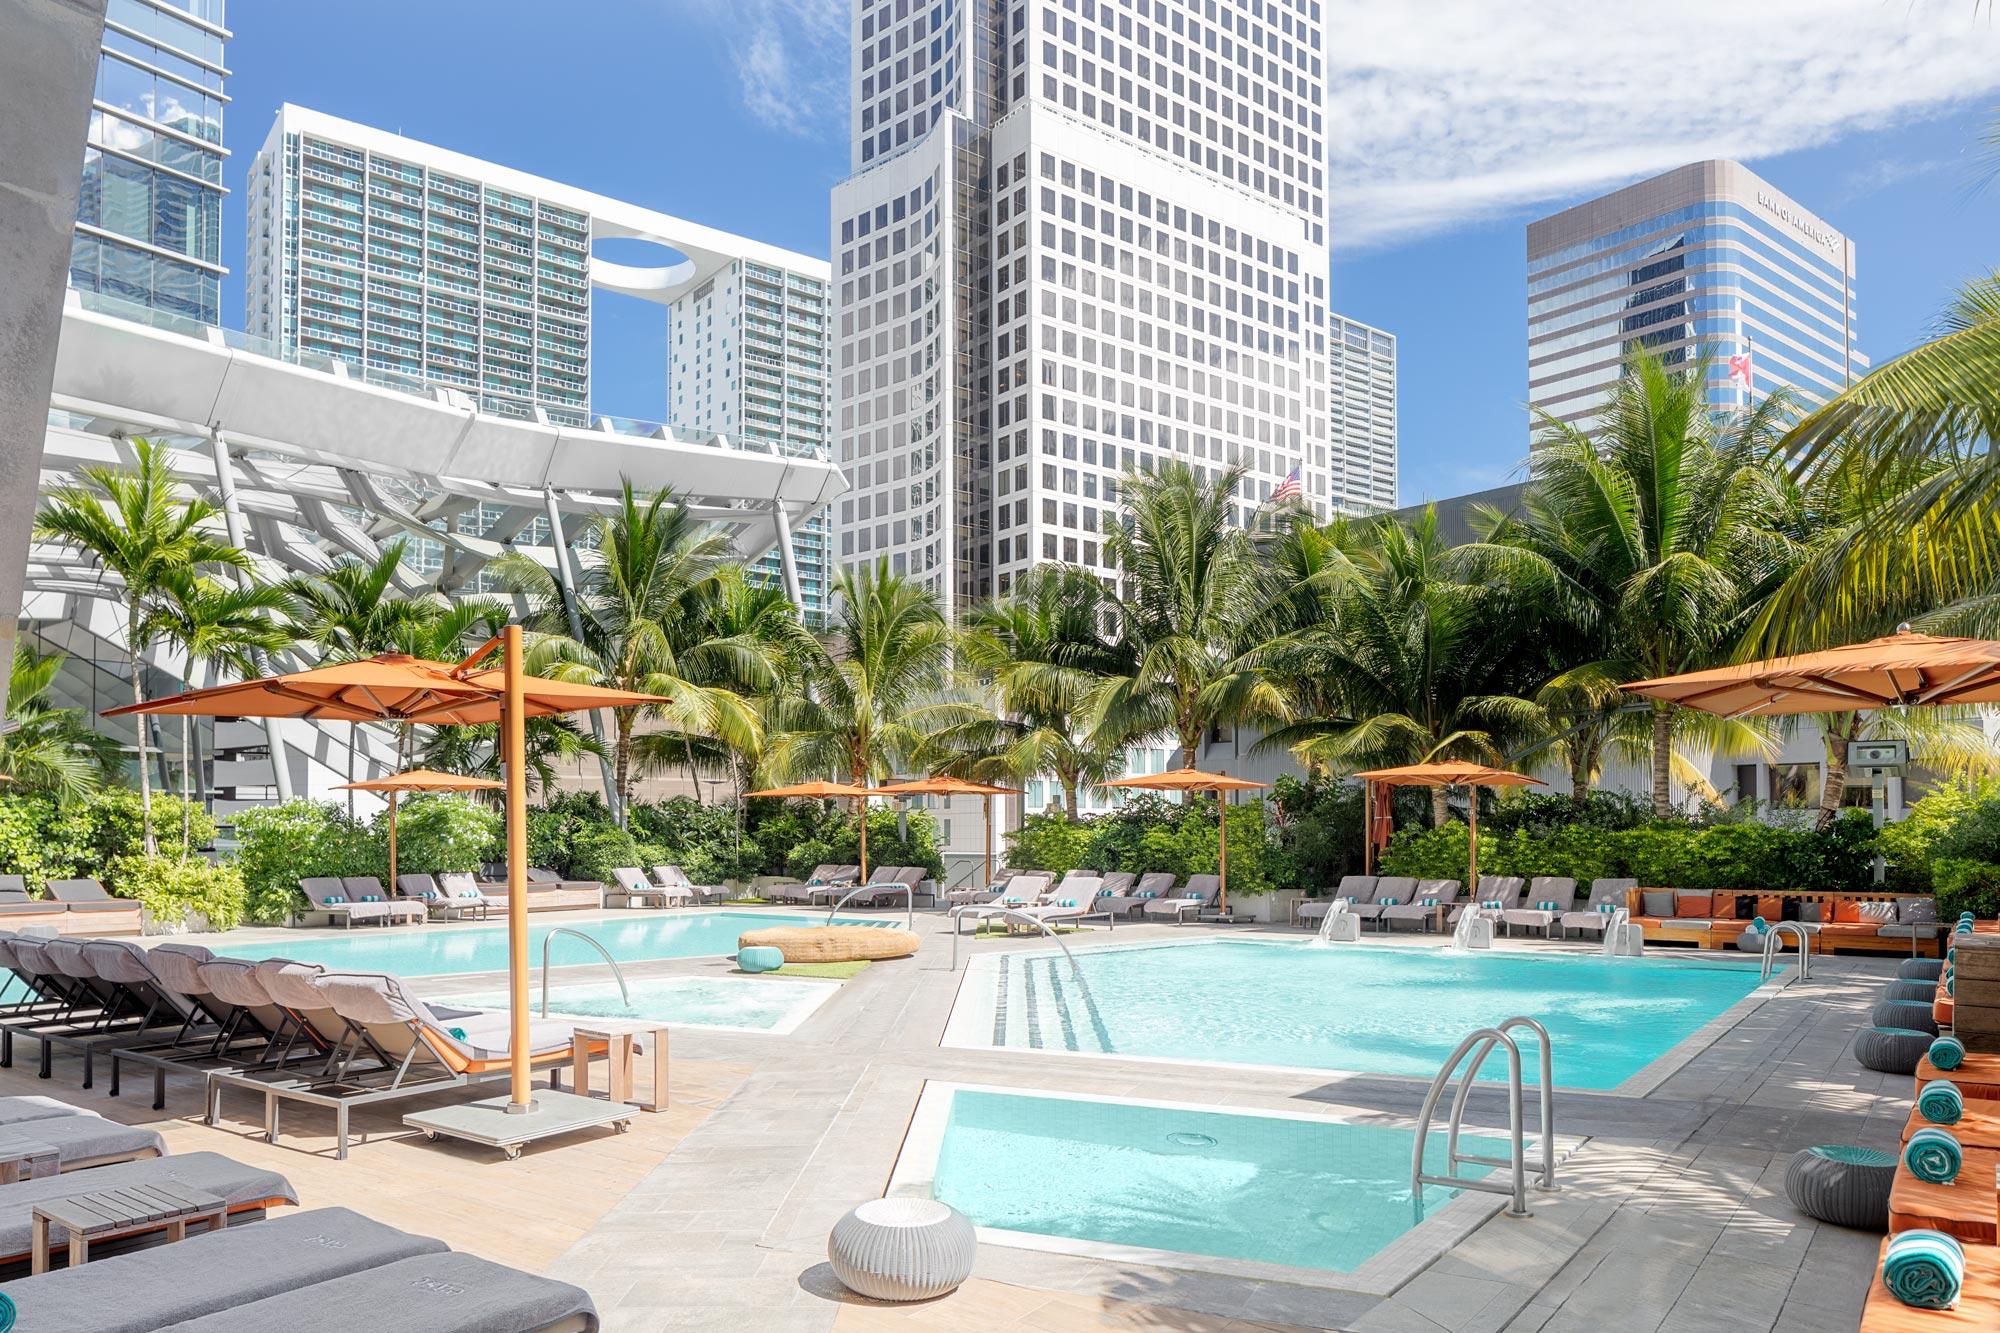 Hotel Pool Photography Miami Florida by Swiss Photographer Adrian Kilchherr